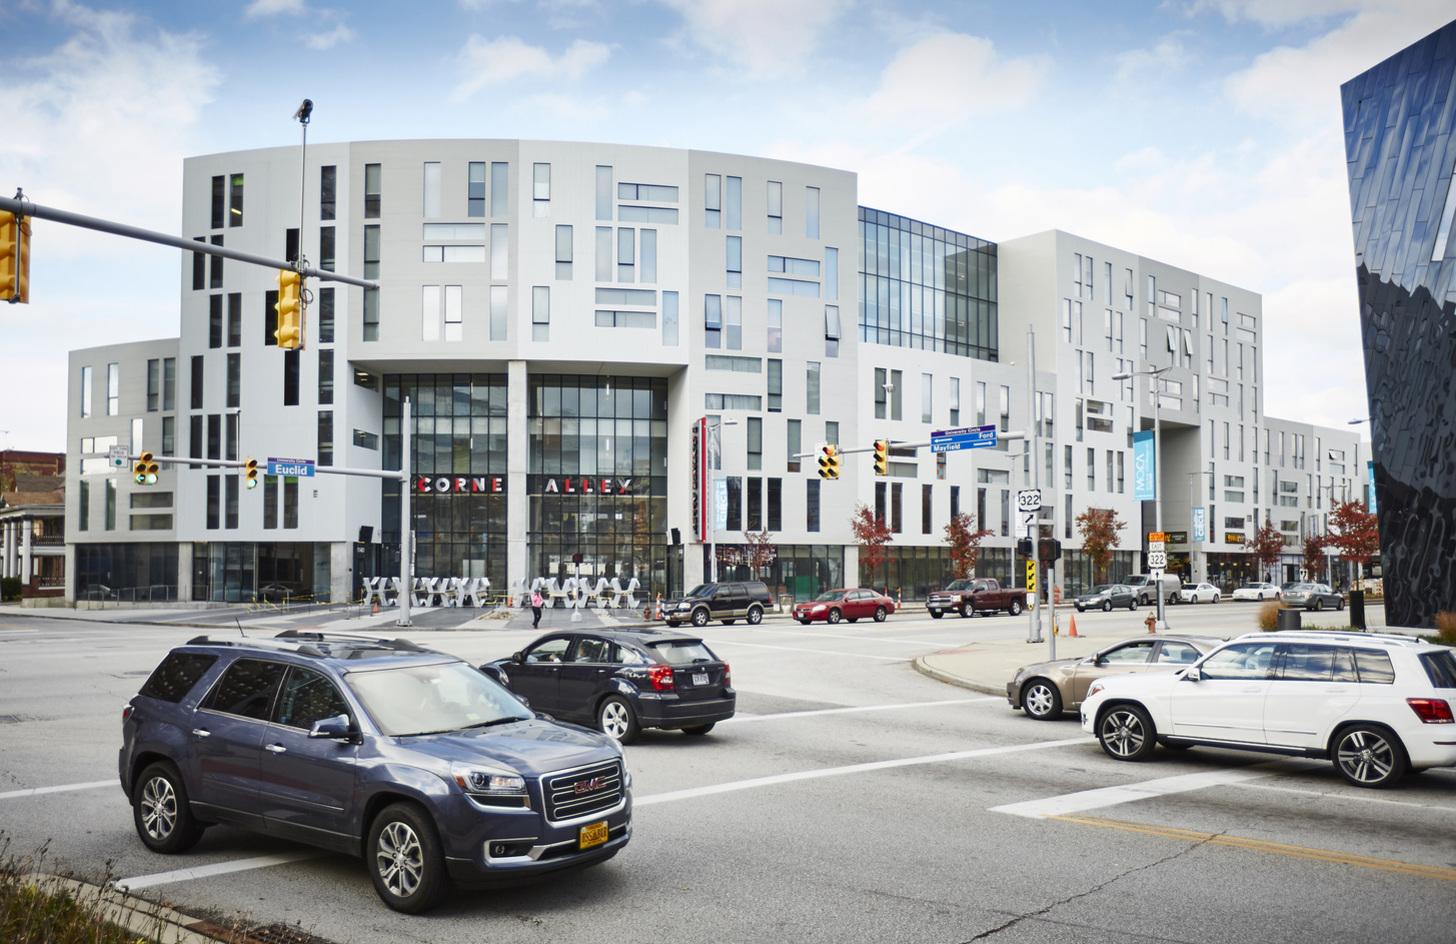 Getting Around & Parking in University Circle